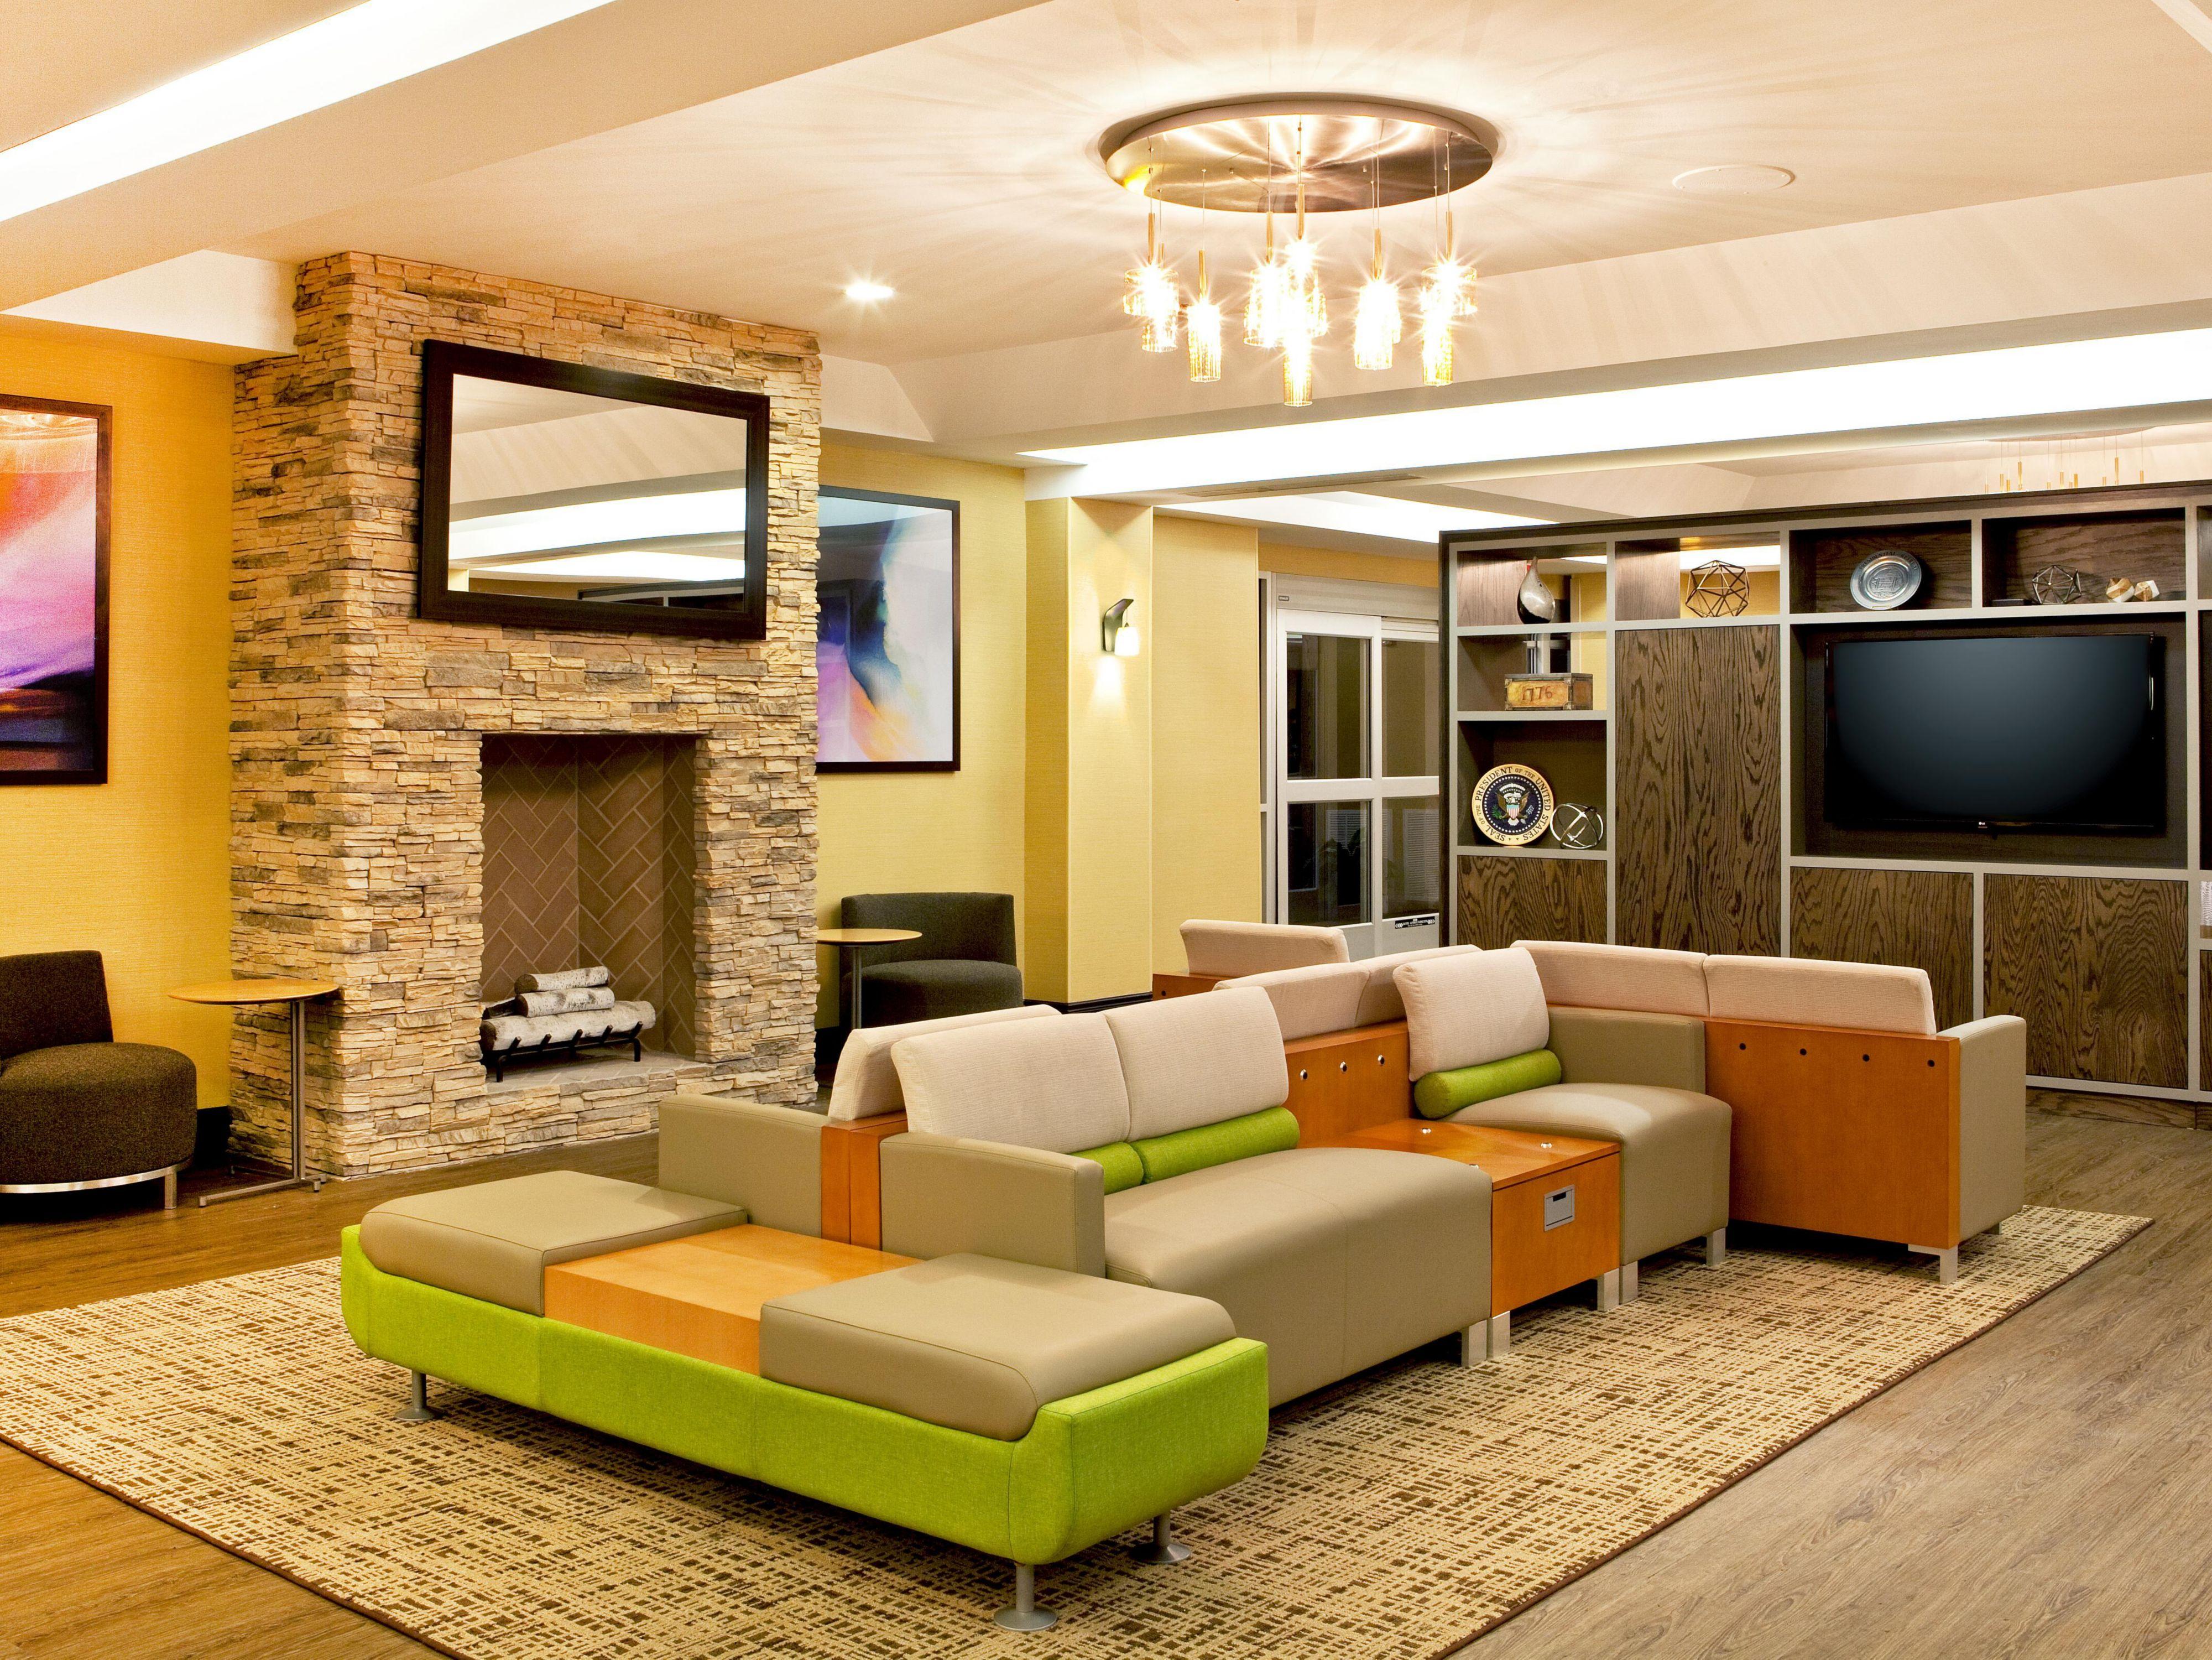 64 Interior Design Jobs Little Rock Ar 10 Good Skills Of Interior Designers Holiday Inn